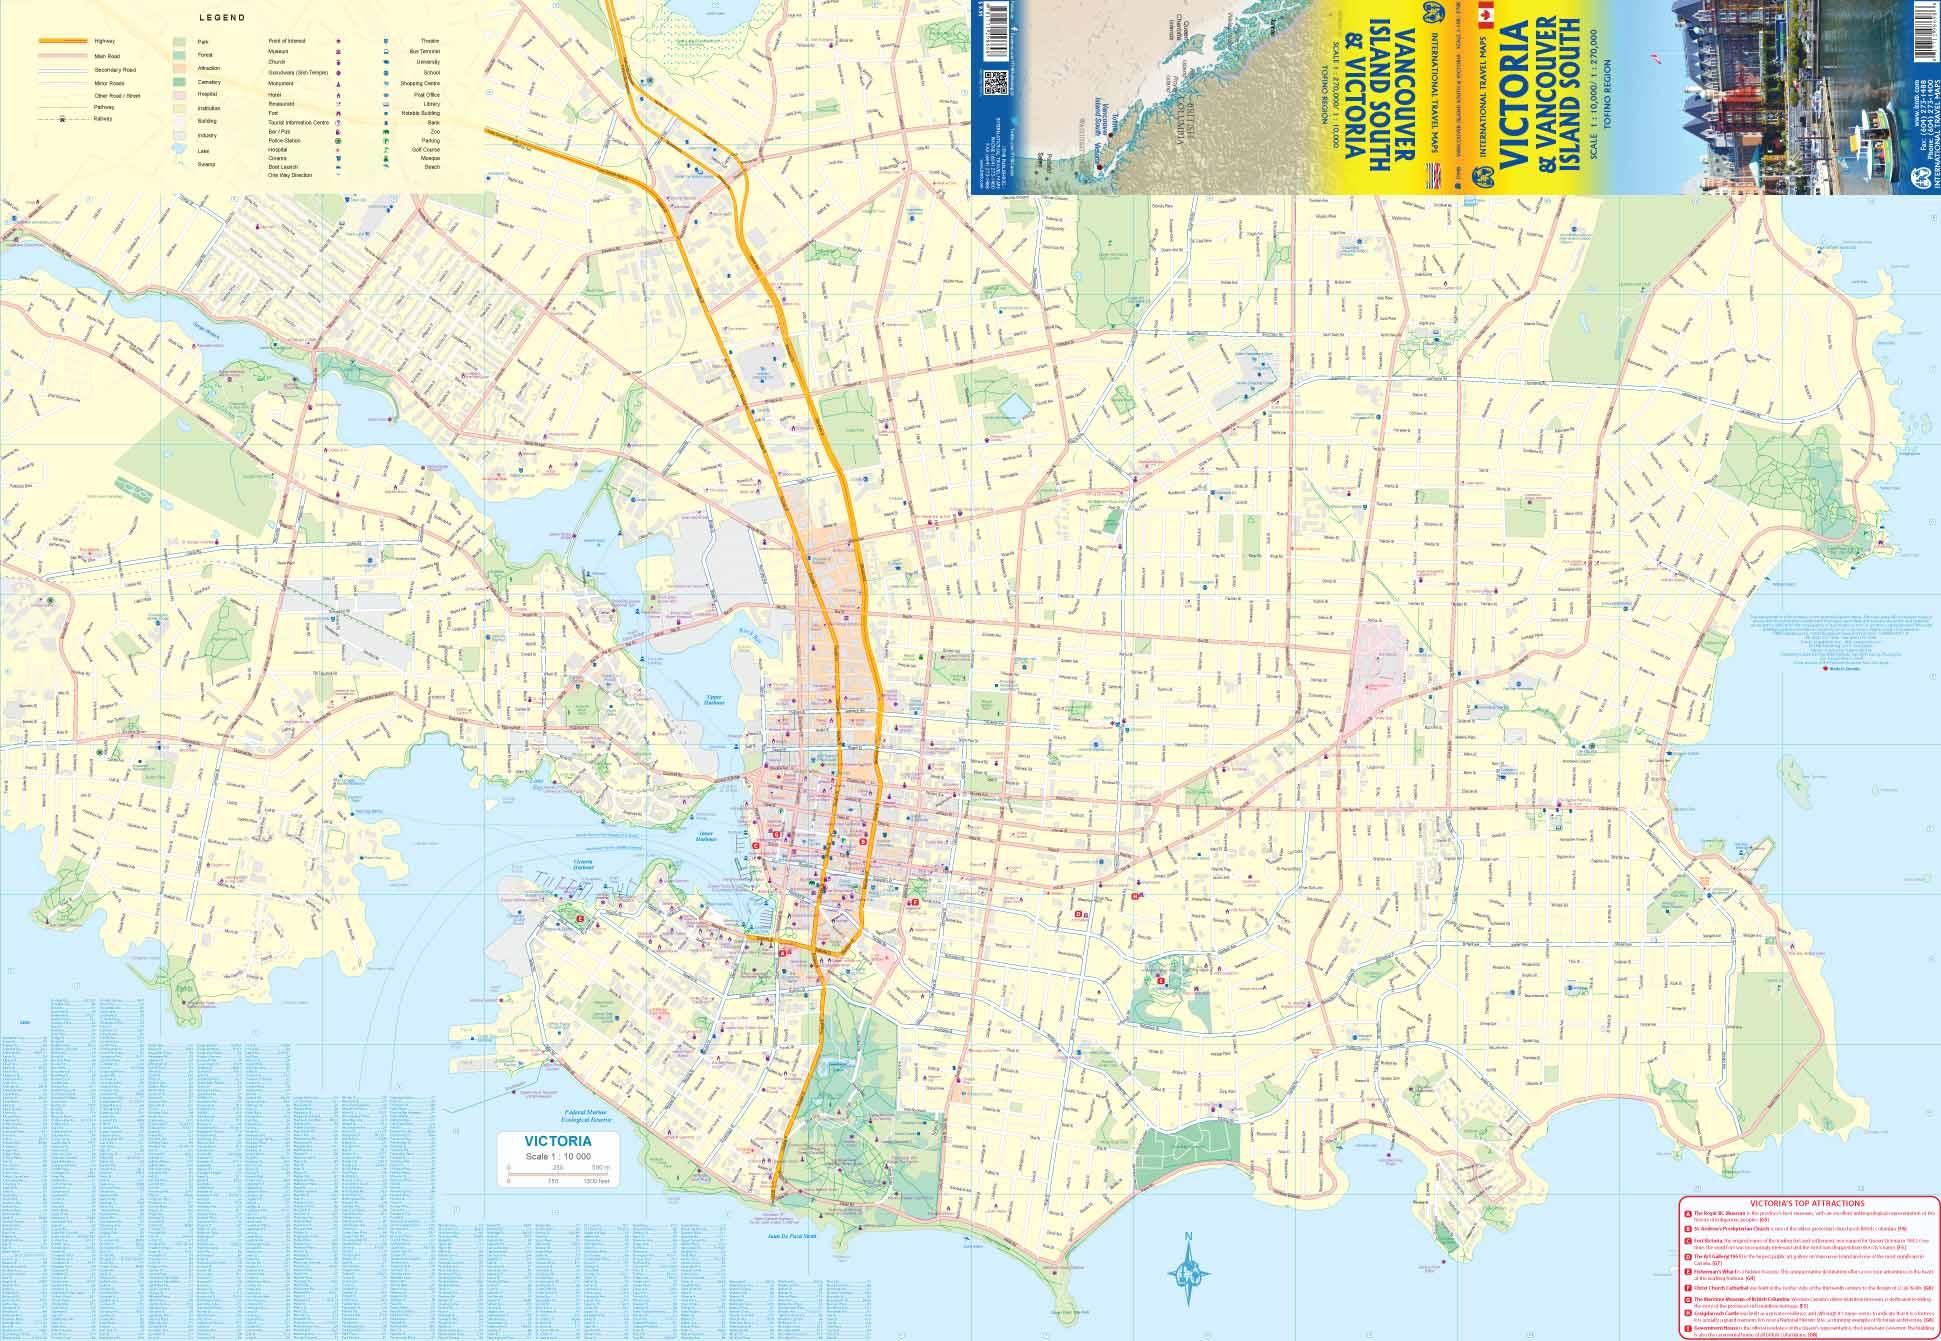 Carte Canada Est Detaillee.Carte Routiere Victoria Vancouver Ile Sud Canada Au 1 10 1 270